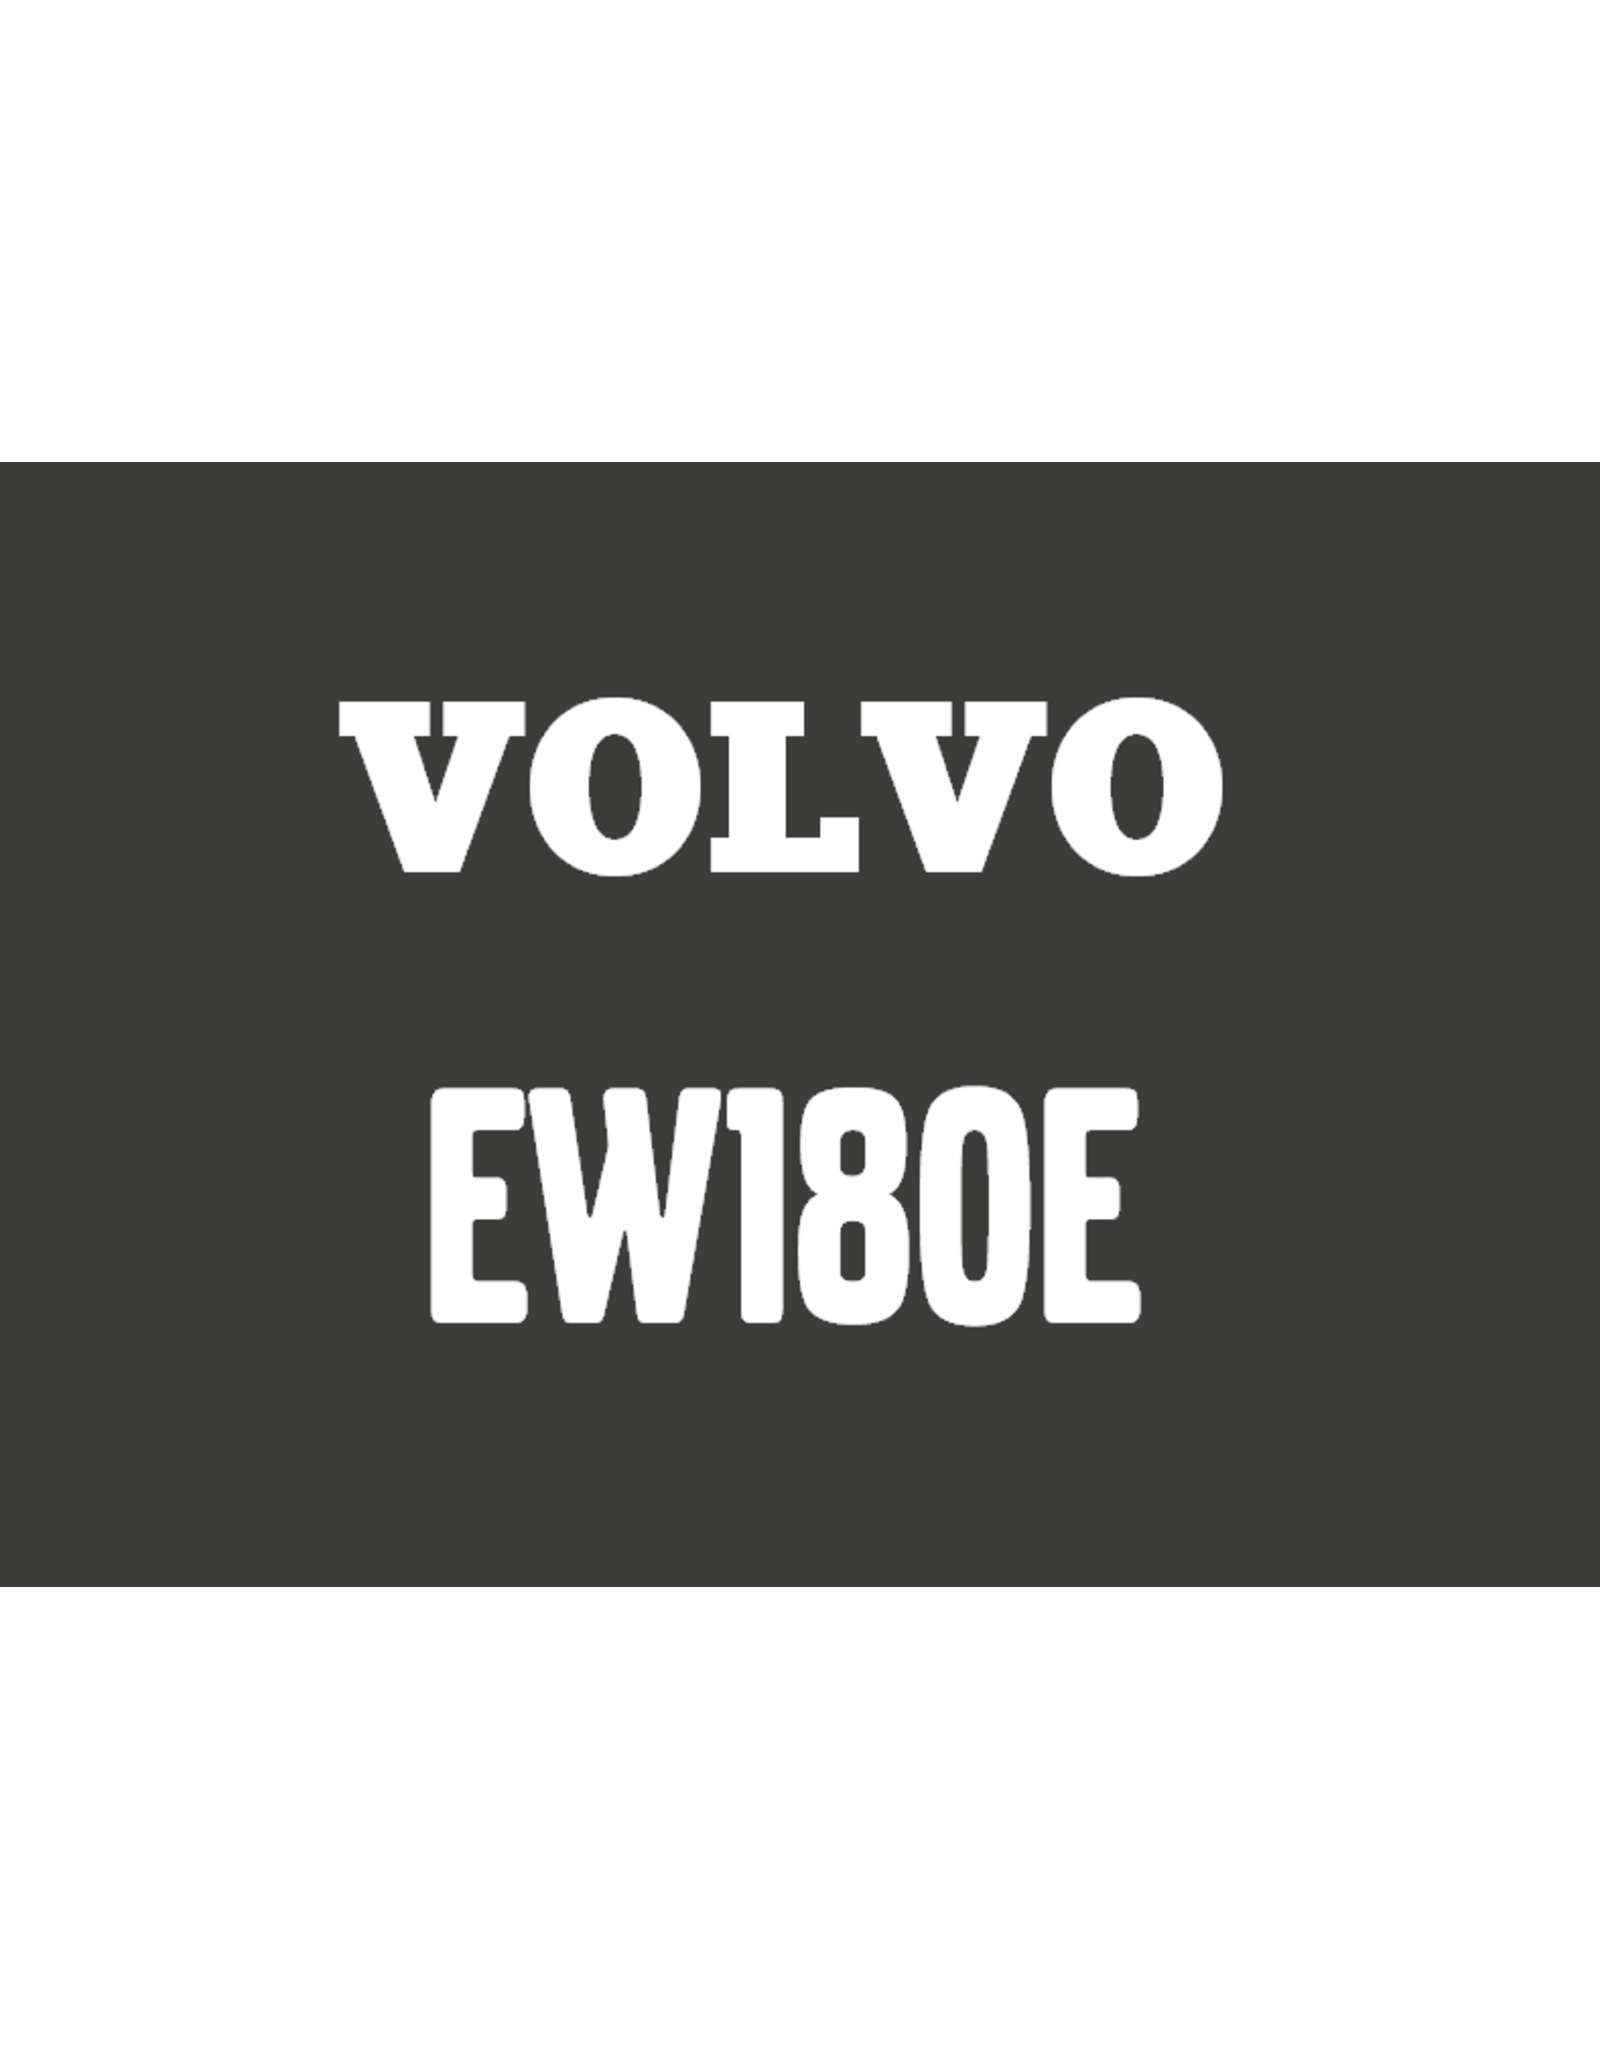 Echle Hartstahl GmbH FOPS for Volvo EW180E